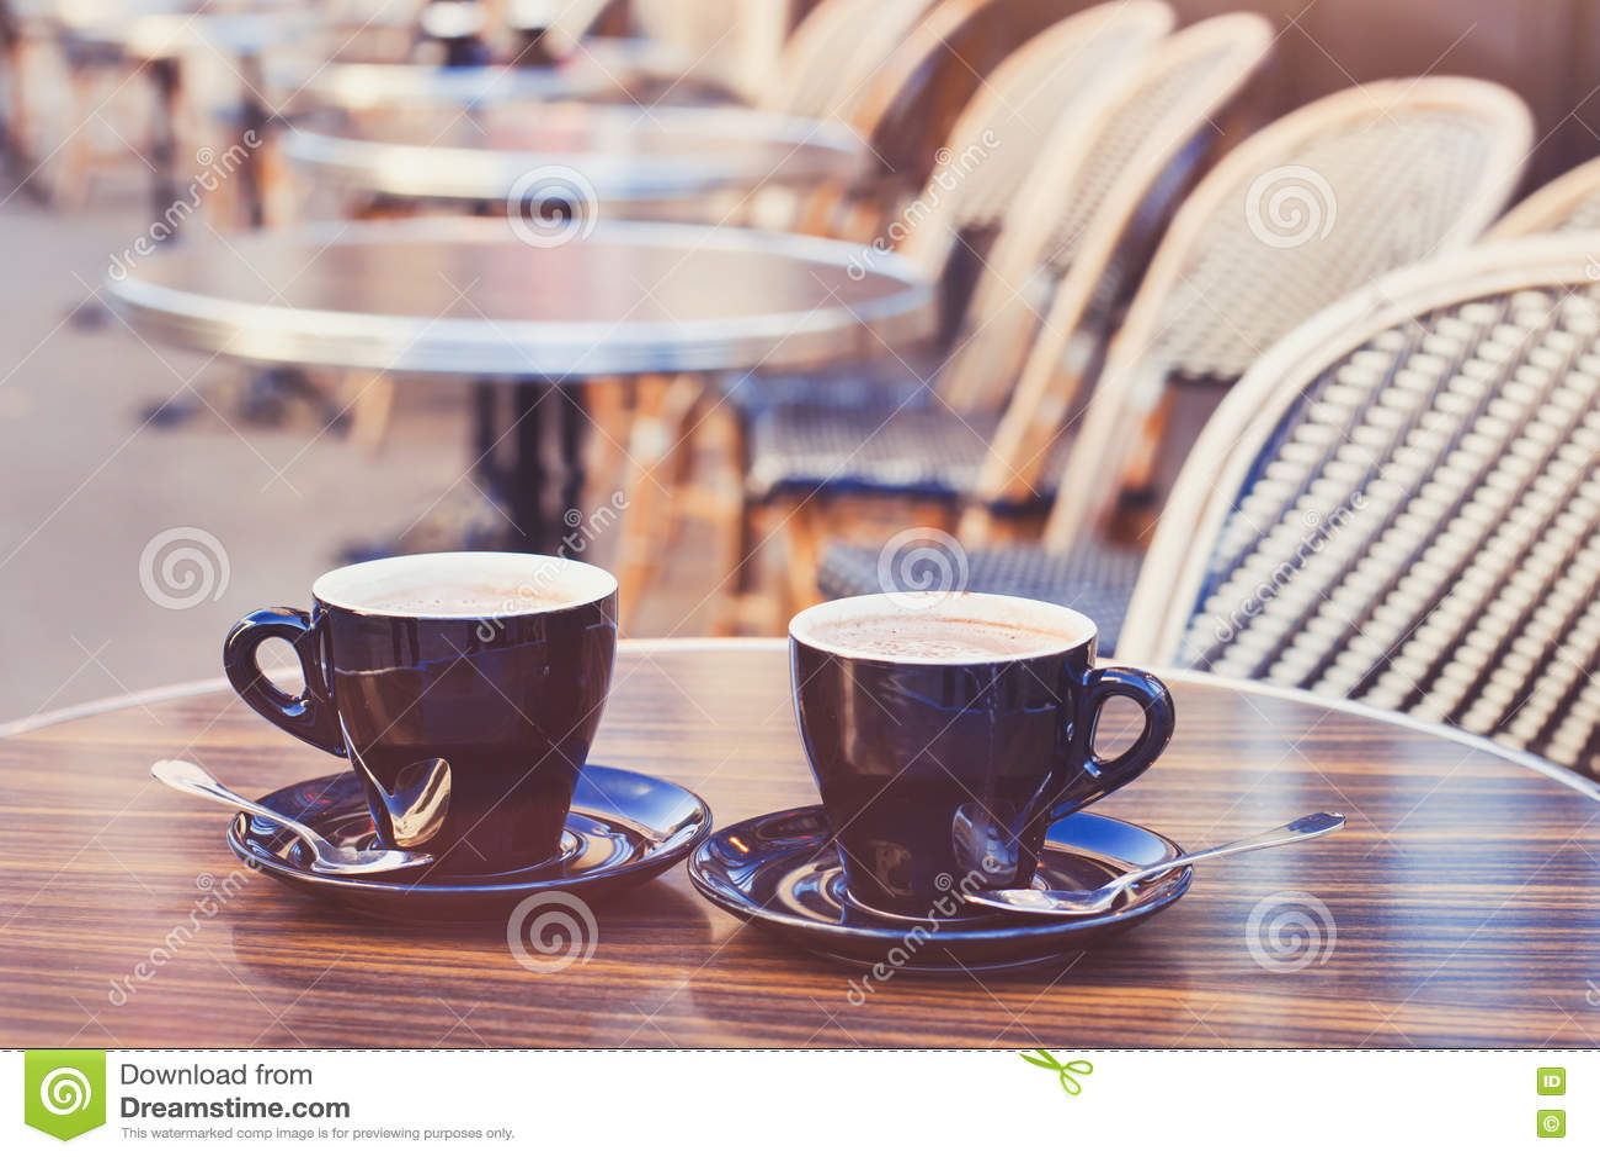 Dois copos do cappuccino do chocolate quente ou do café